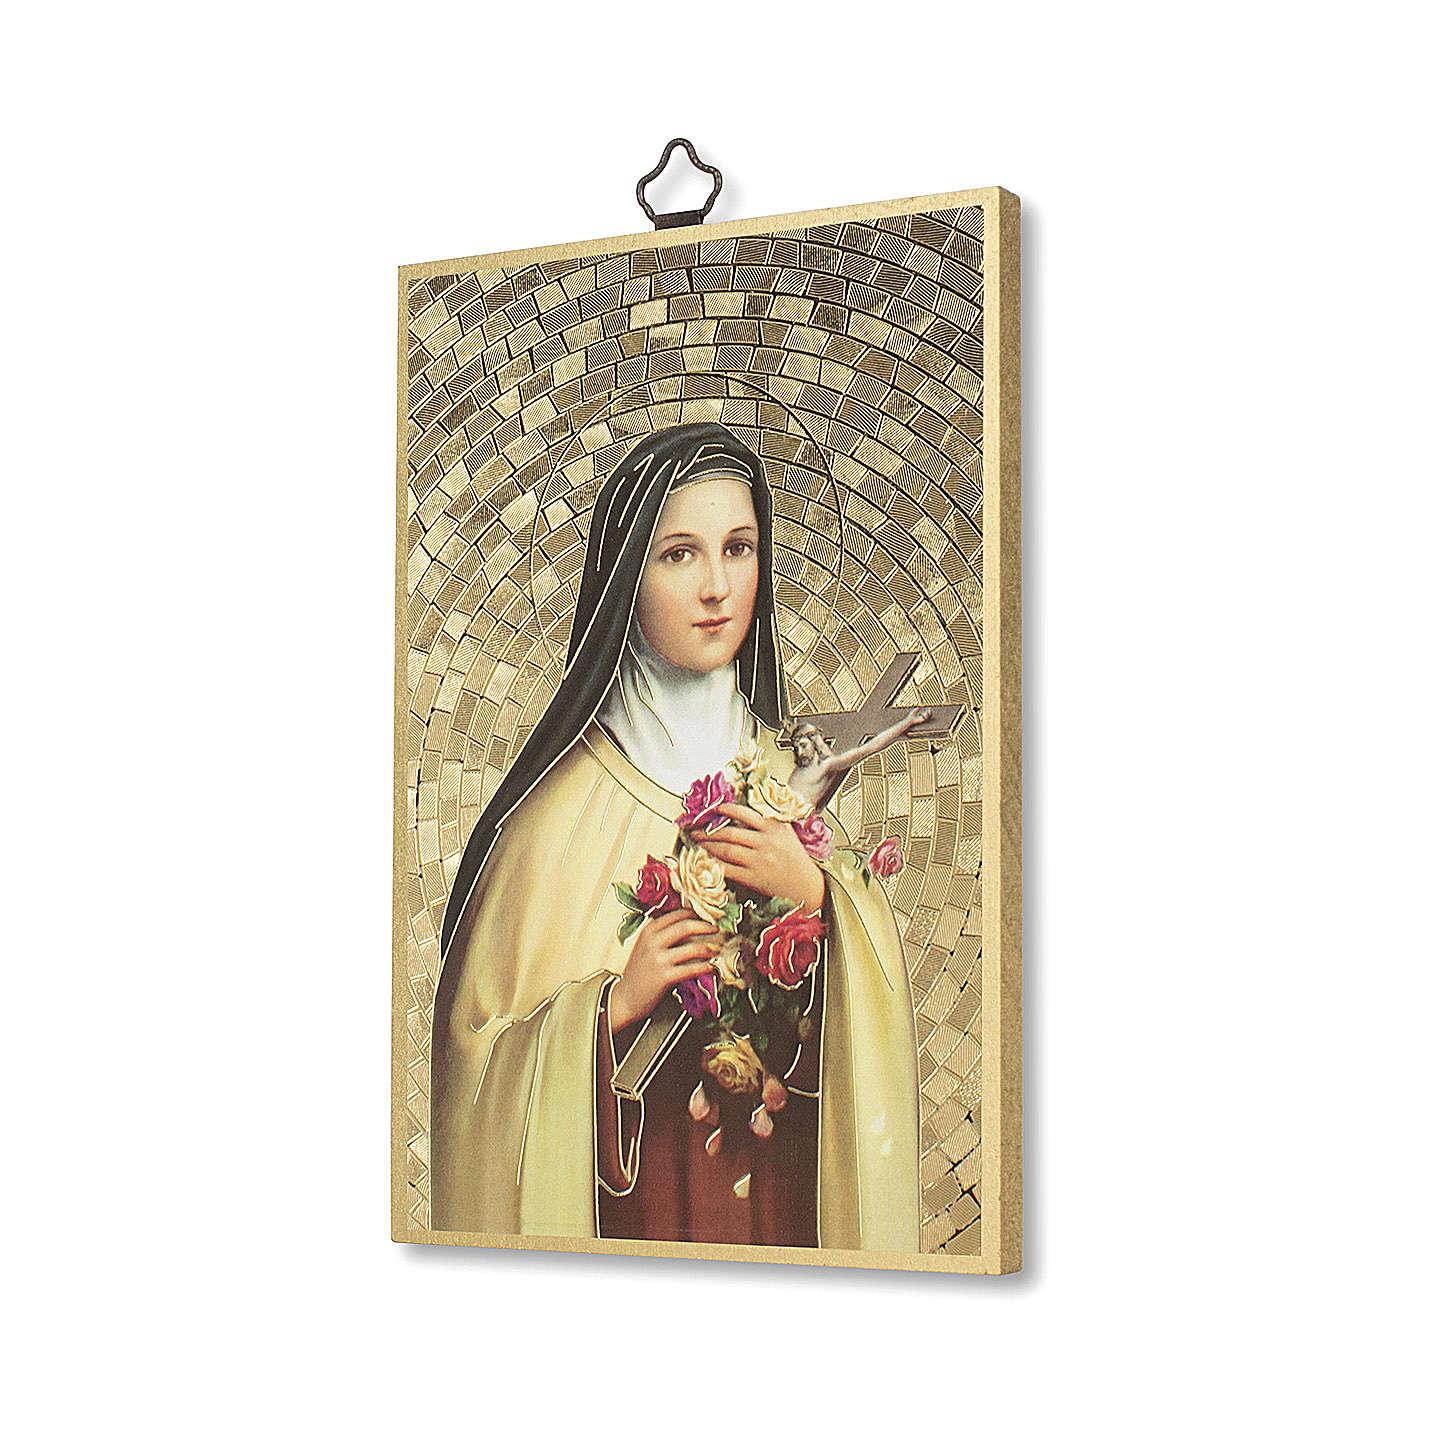 Stampa su legno Santa Teresa di Lisieux Preghiera a Santa Teresa ITA 3